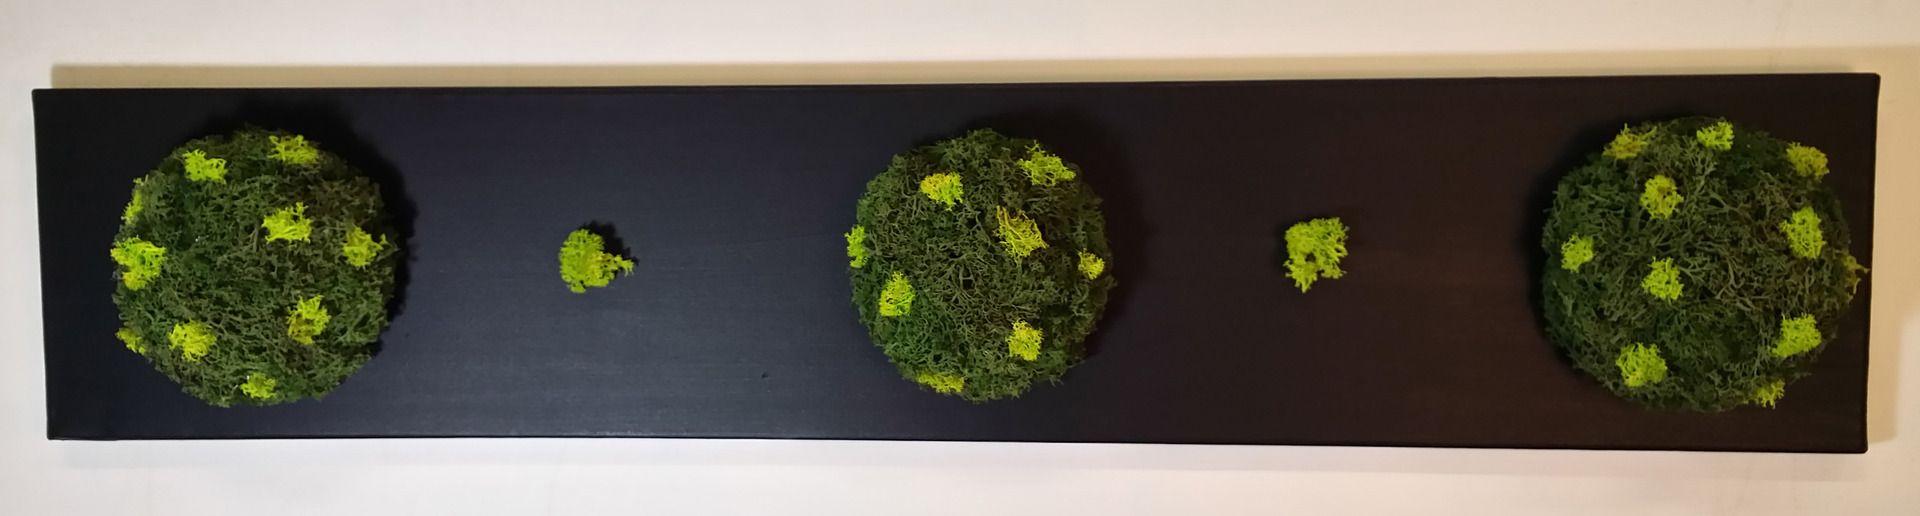 tableau v g tal stabilis 20 x 100 cm 3 demi sph res lichen bicolore 011 d corations murales. Black Bedroom Furniture Sets. Home Design Ideas